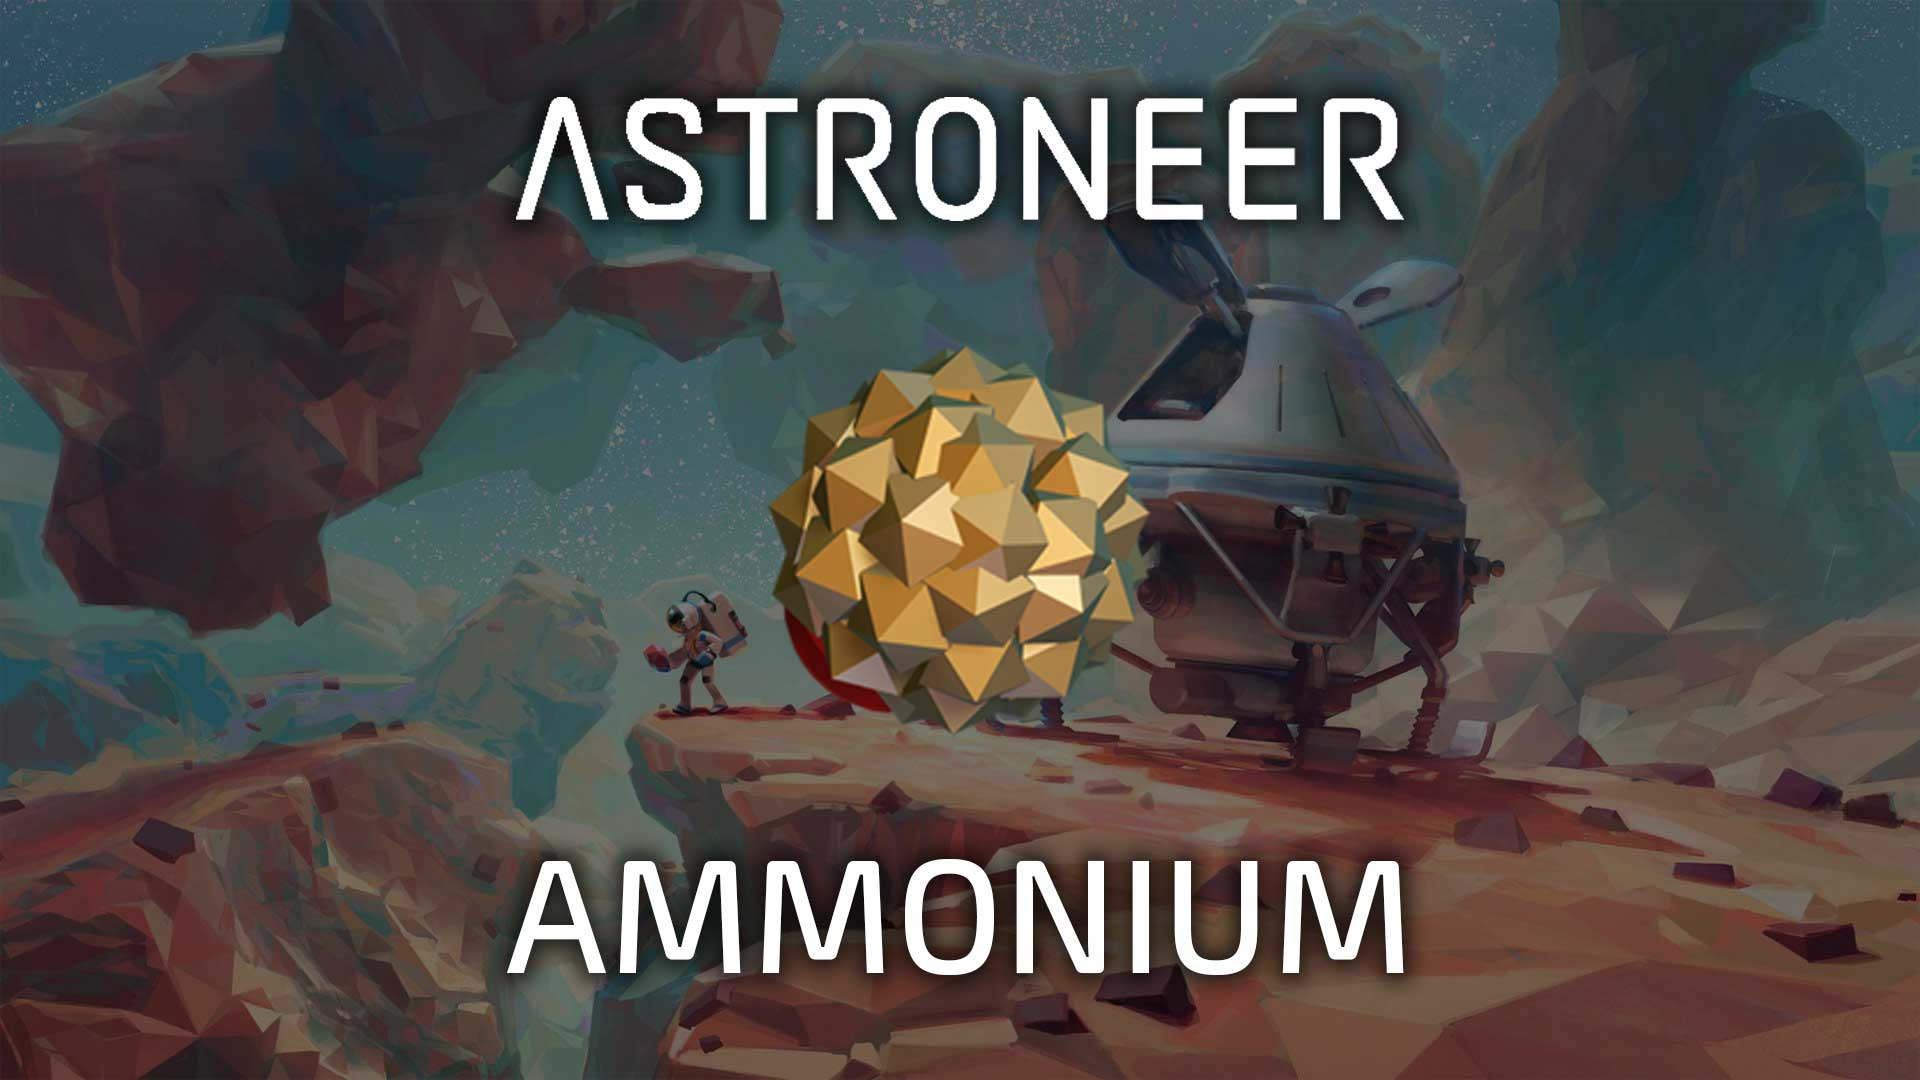 Astroneer Ammonium